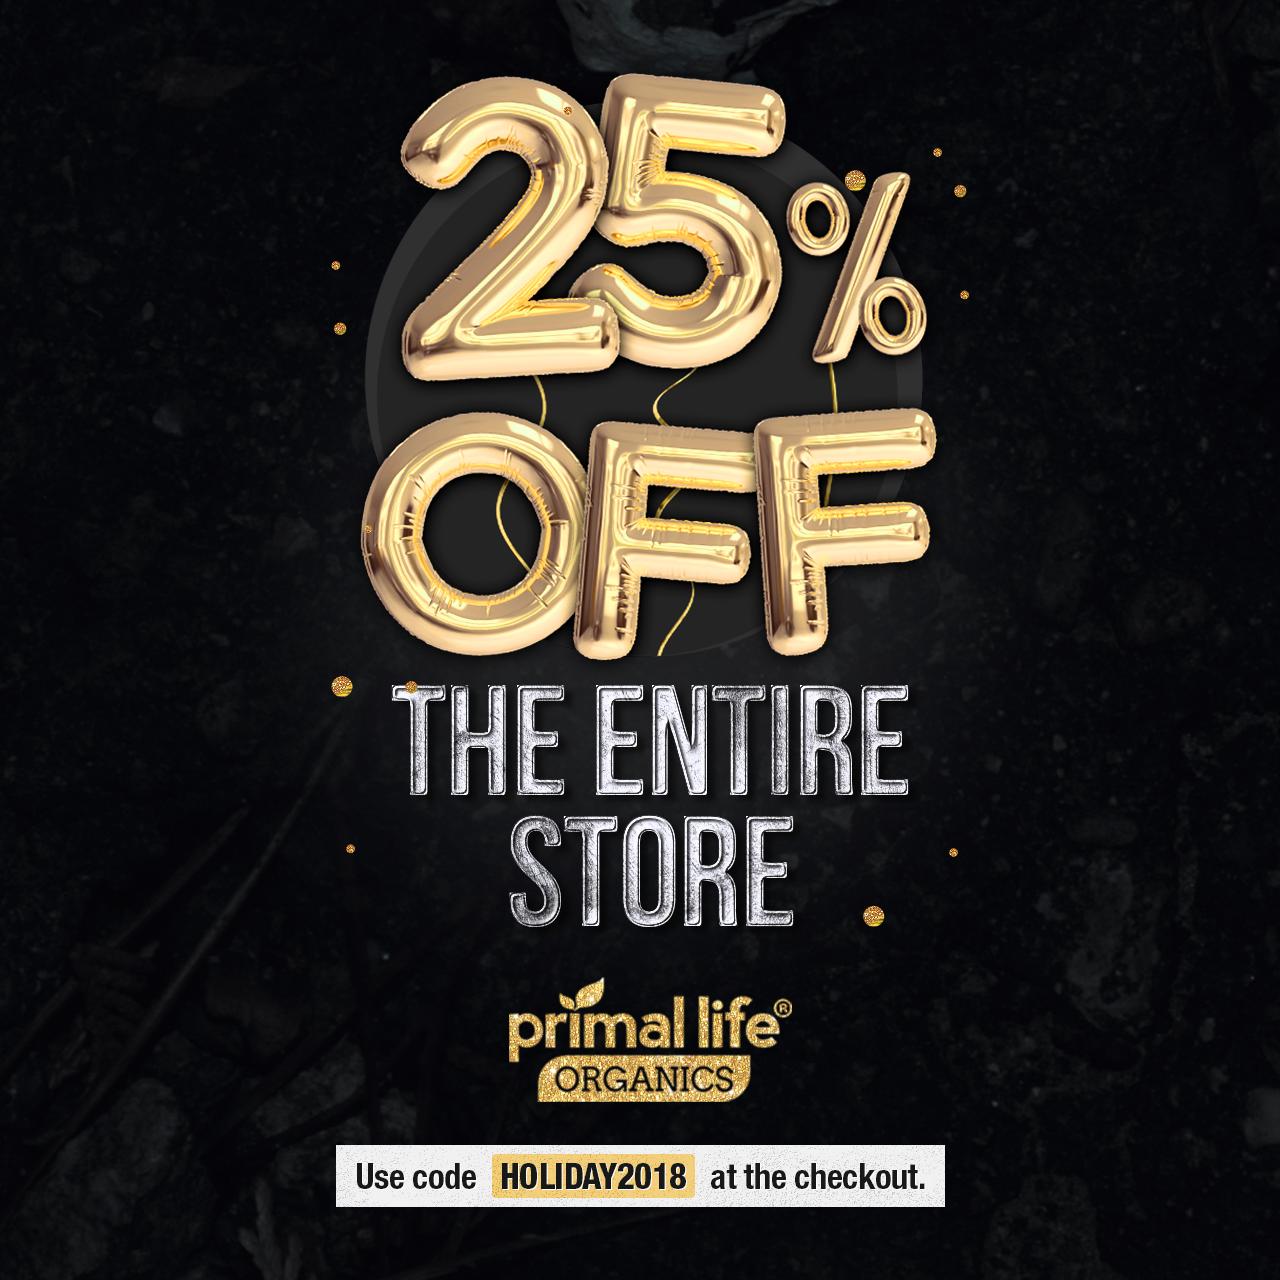 primal life organics black friday coupon code